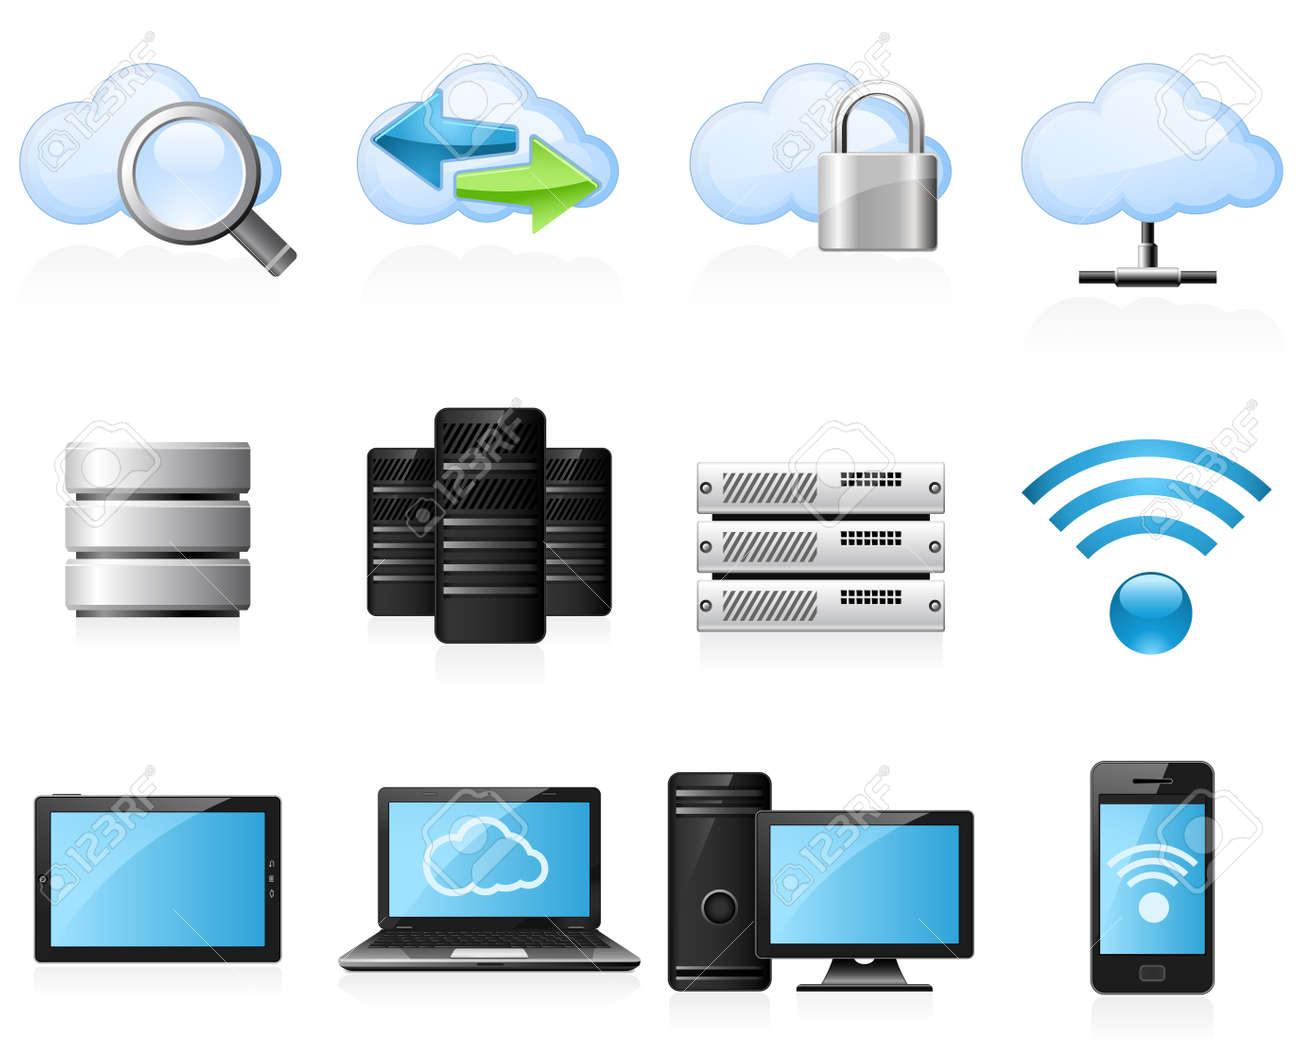 Cloud computing icons Stock Vector - 13043101